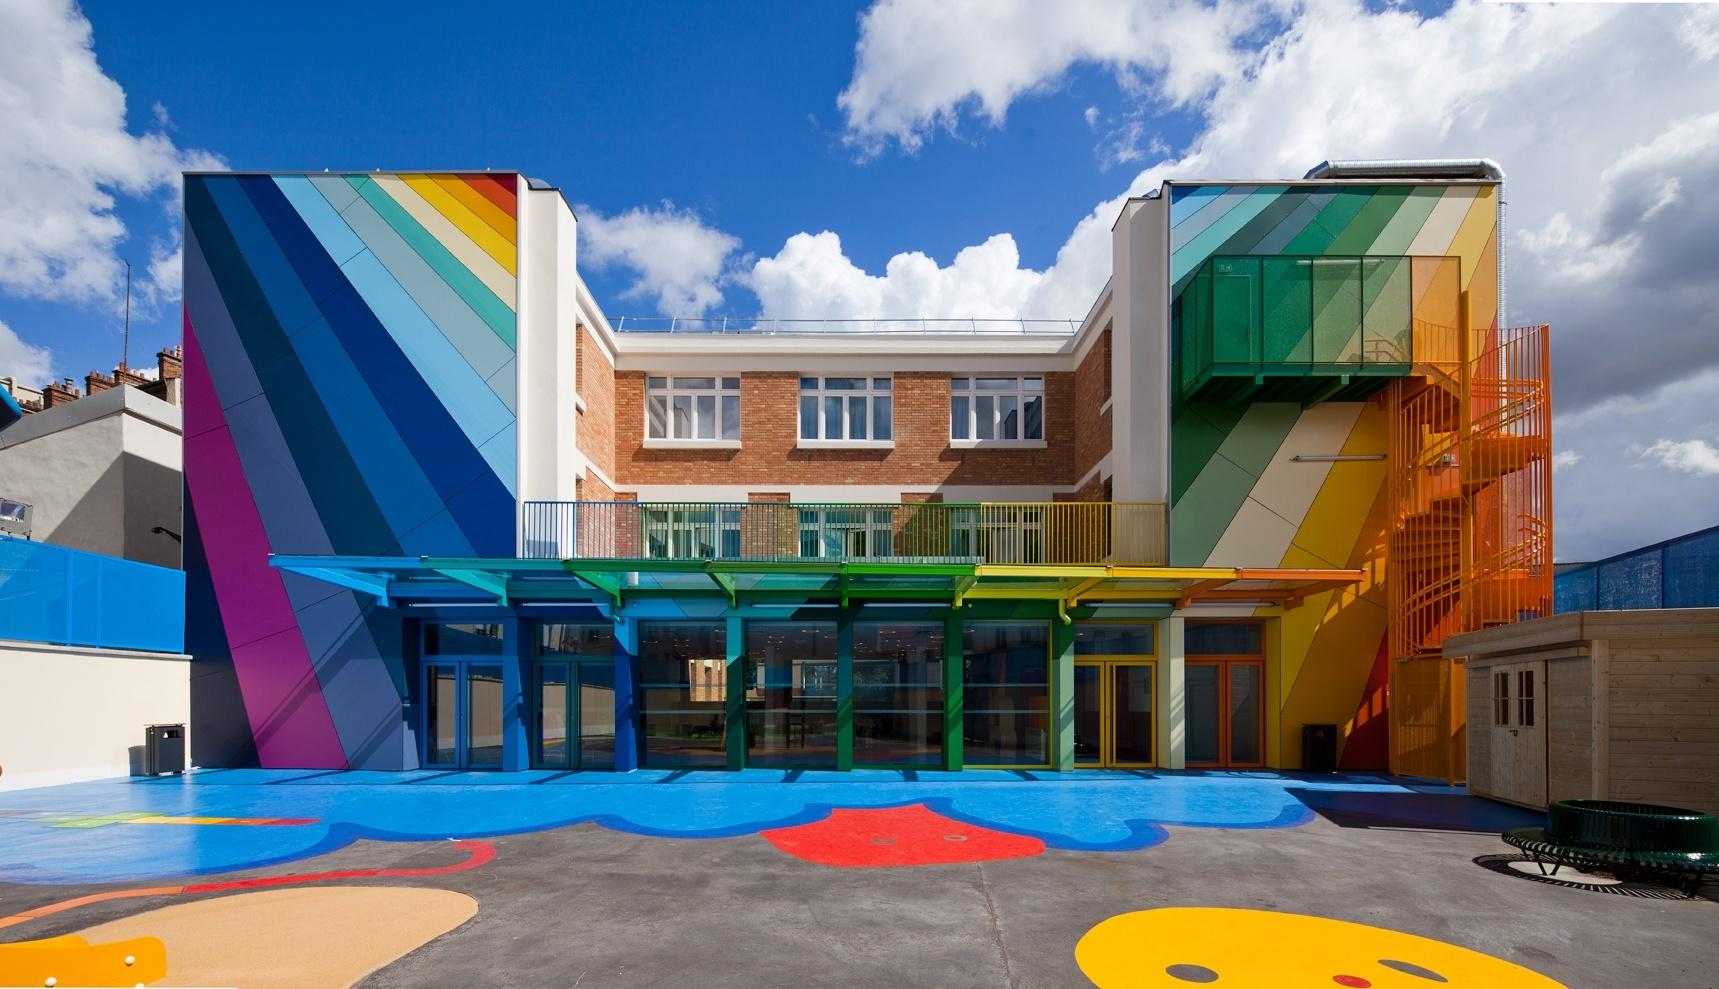 巴黎ecole maternelle pajol幼儿园图片